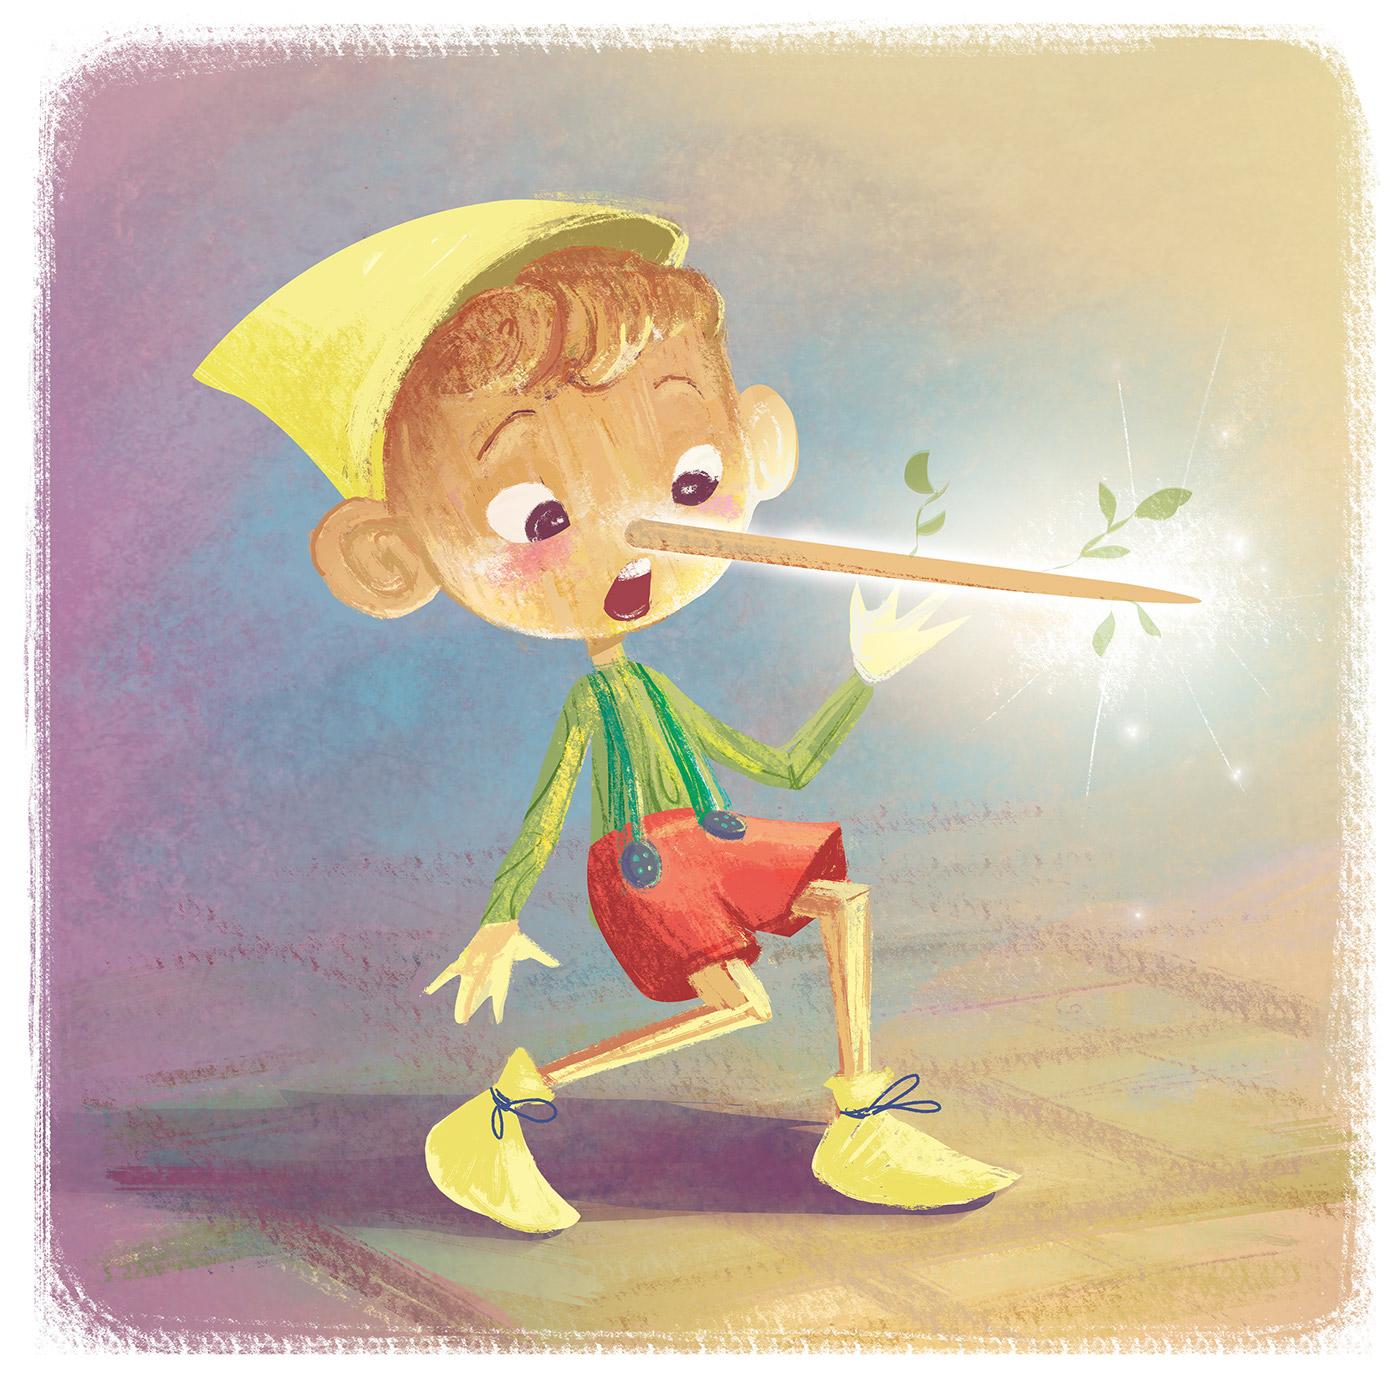 ILLUSTRATION  tale children digital pinocchio children's story fairy Character design